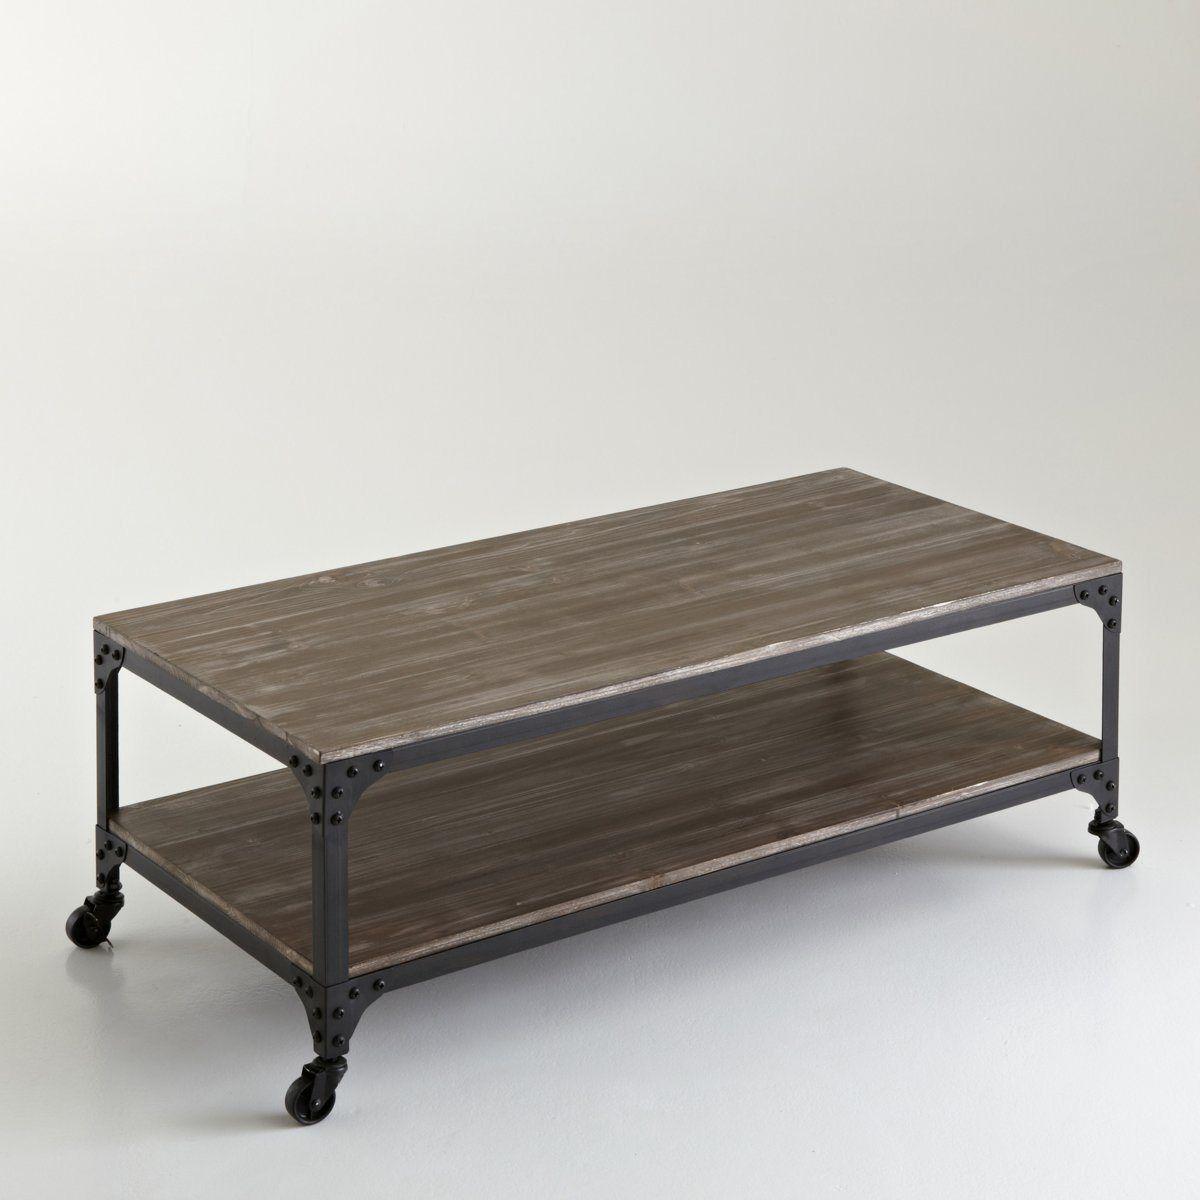 Table Basse A Roulettes Style Indus 2 Modeles Hiba La